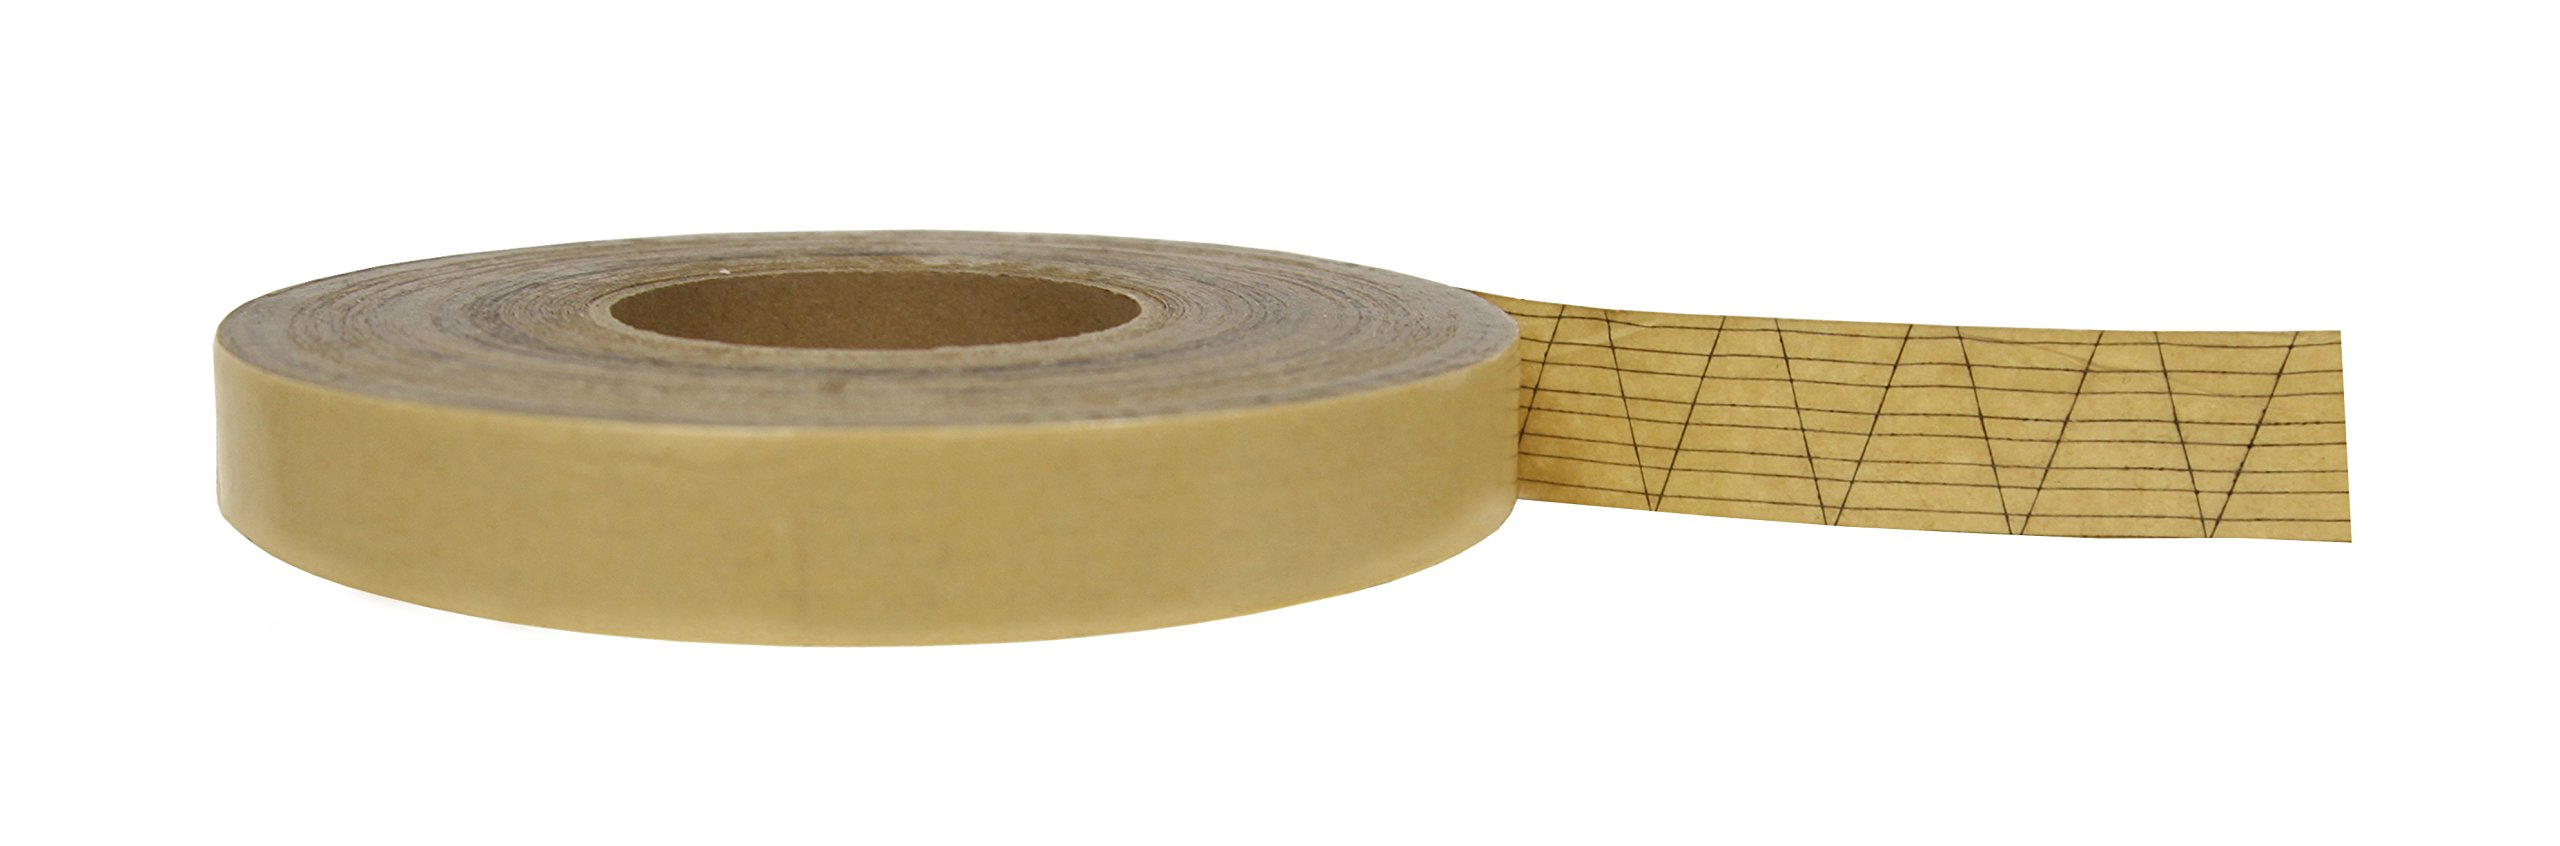 Trimaco Scrim Reinforced Tape, 1.5-inch x 164-feet, 8 rolls by Trimaco